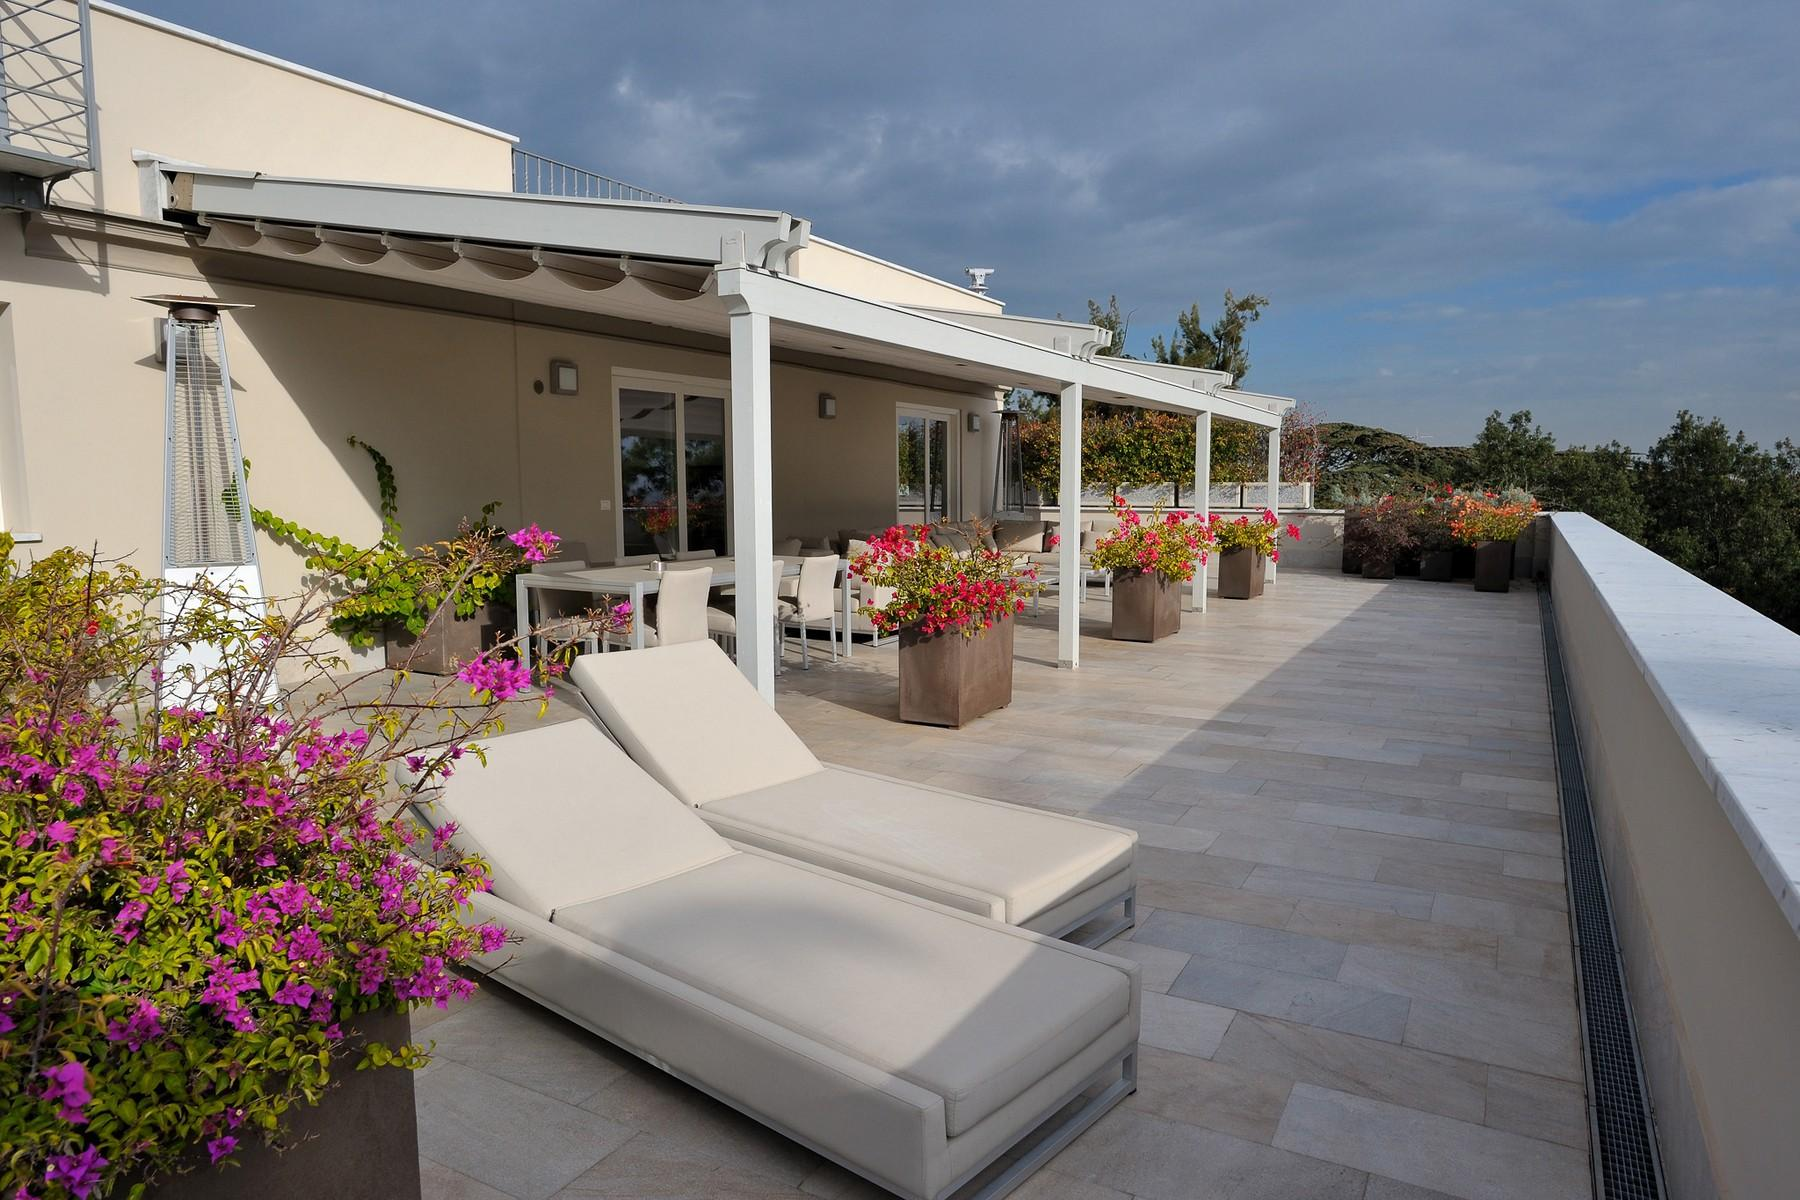 Villa Calandrelli, Charme und Stil im grünen Herzen Roms - 7